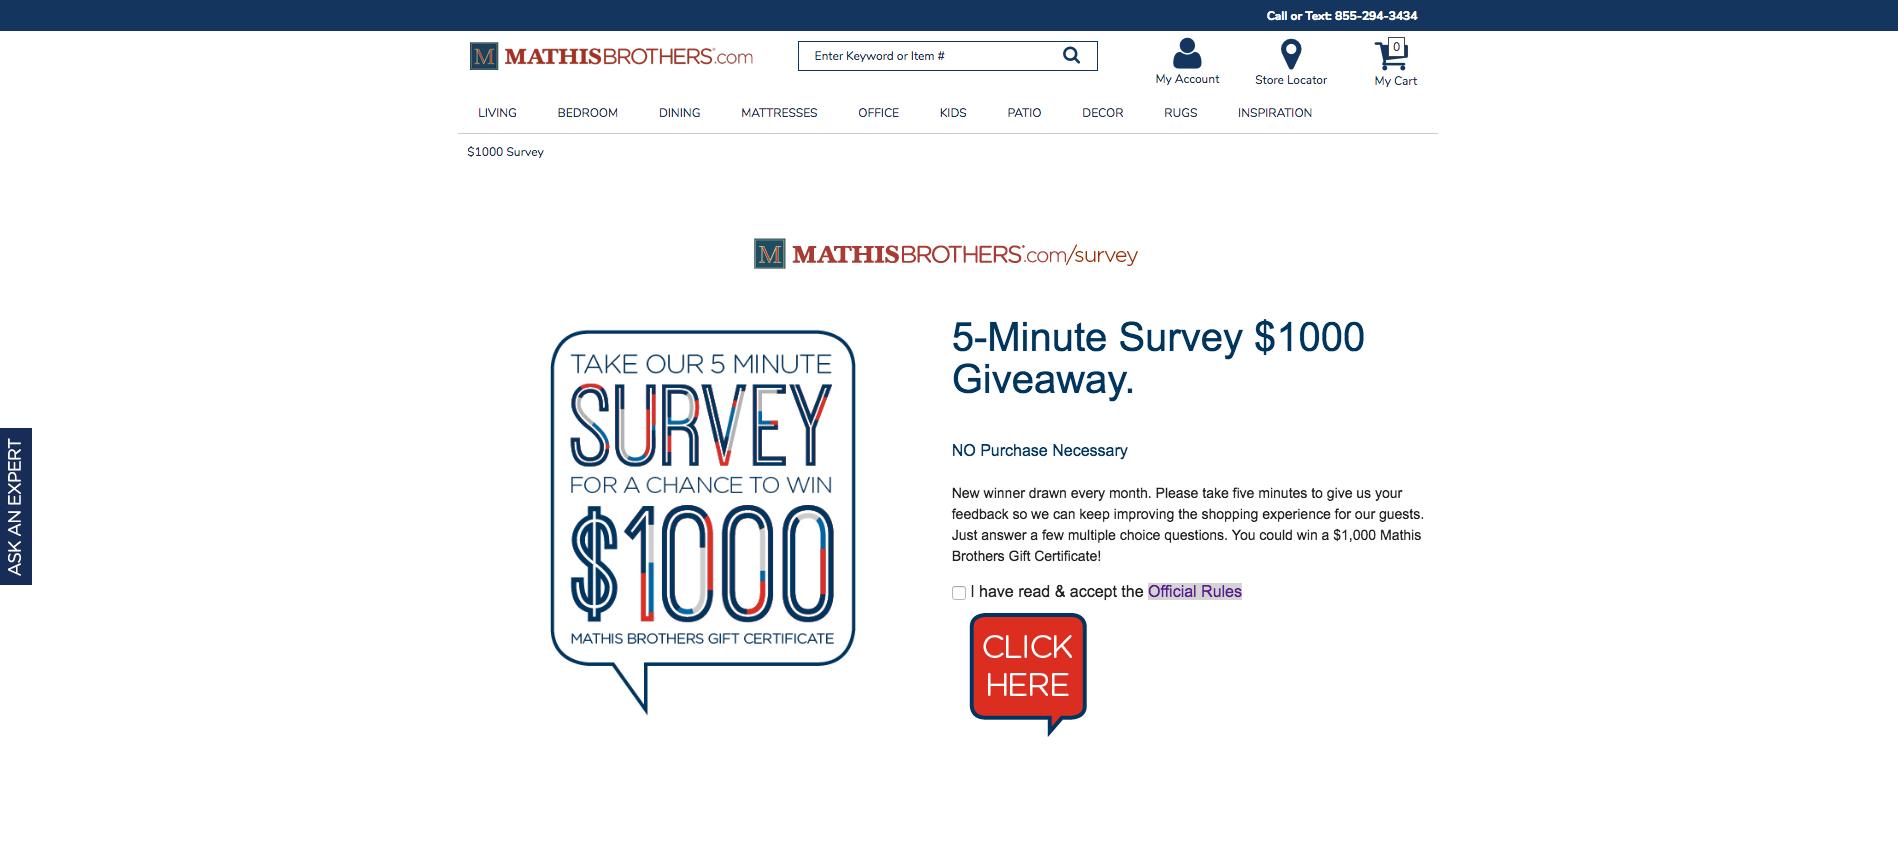 www.mathisbrothers.com/survey